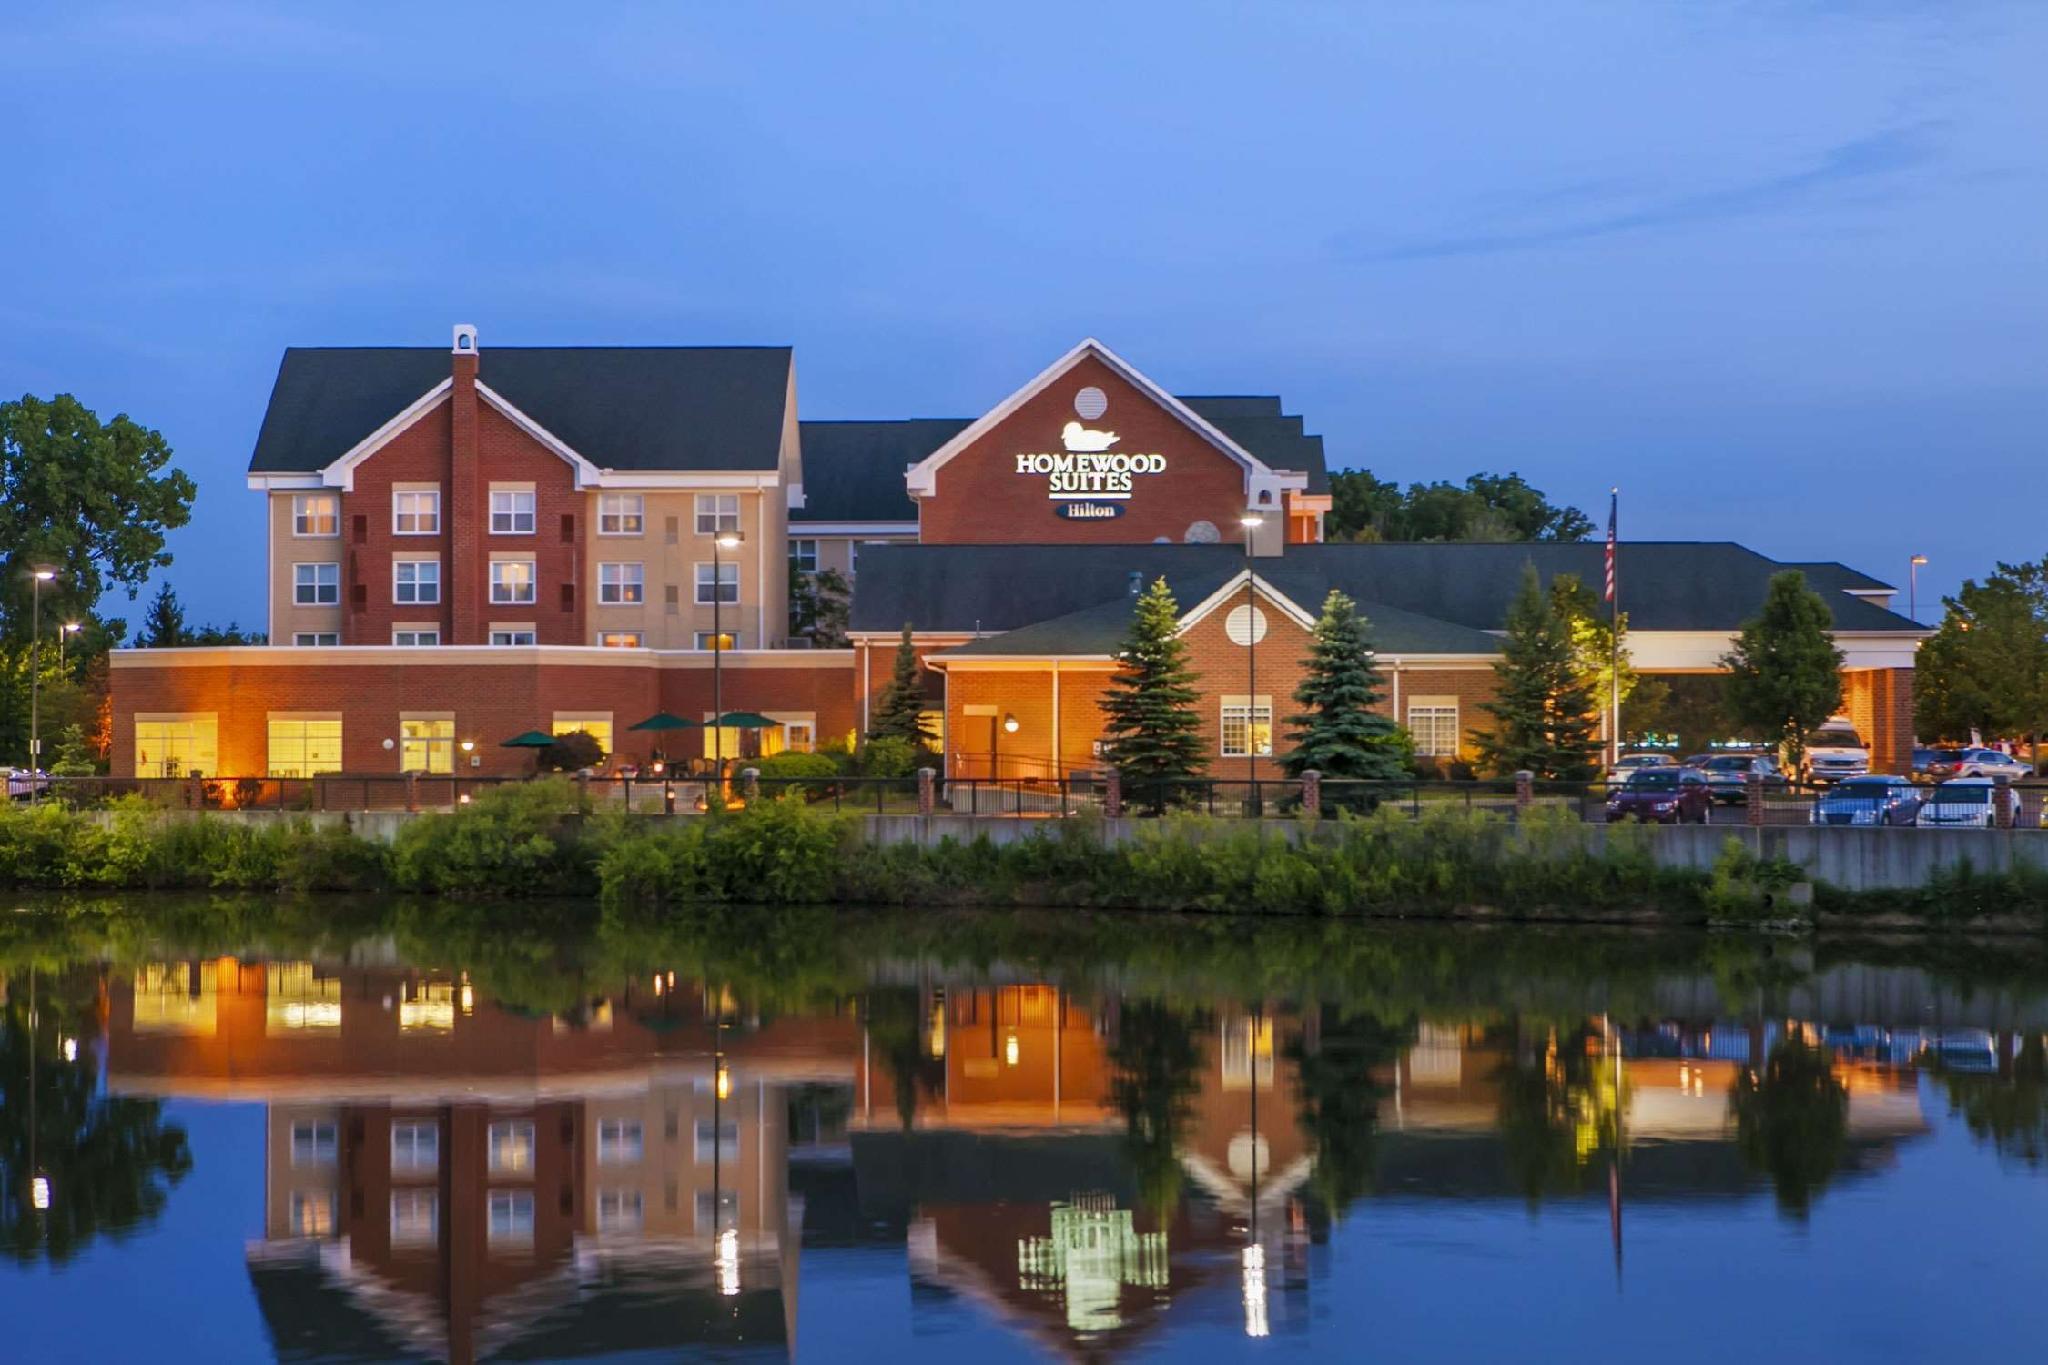 Homewood Suites By Hilton Cleveland Solon Hotel